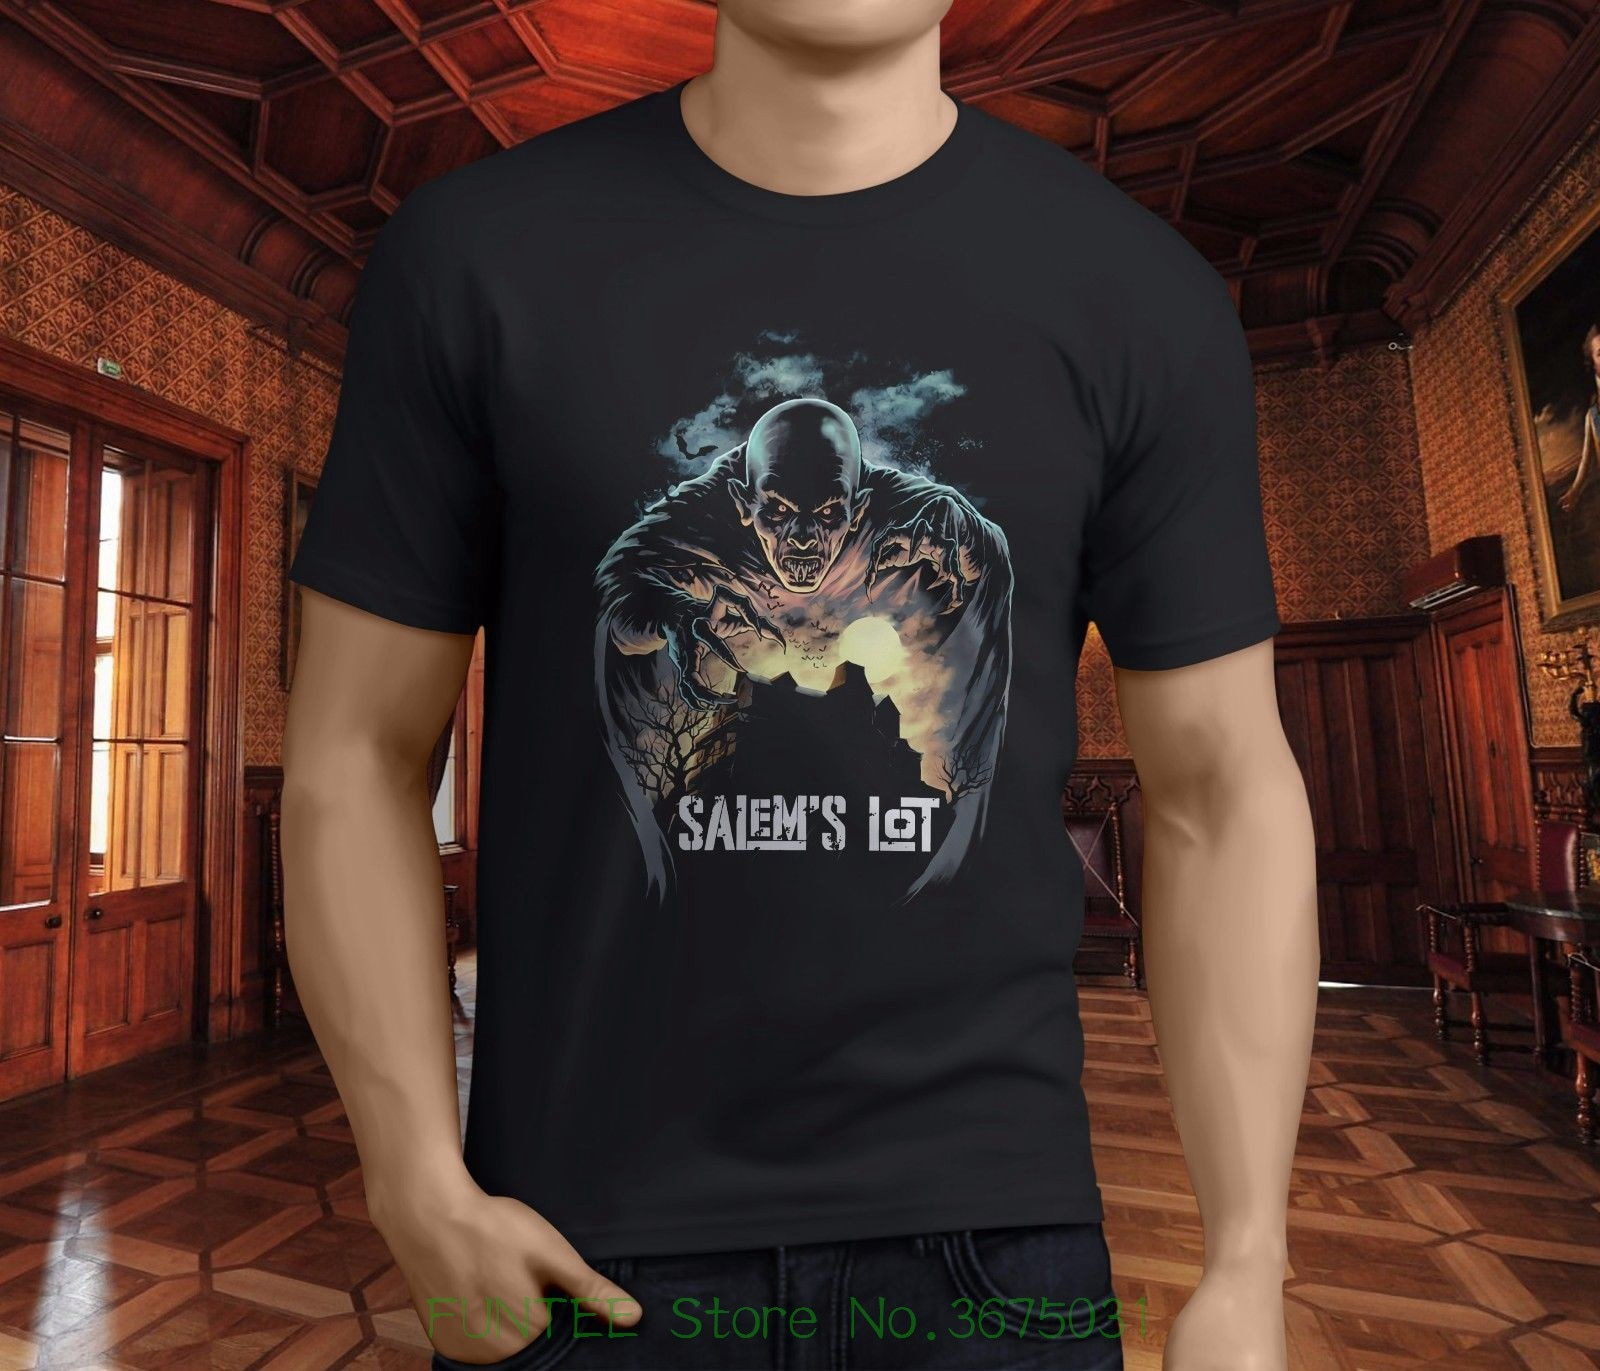 Camiseta de manga corta de moda camiseta nuevo Popular Salems Lot American Horror Show hombres camiseta negra S-3xl